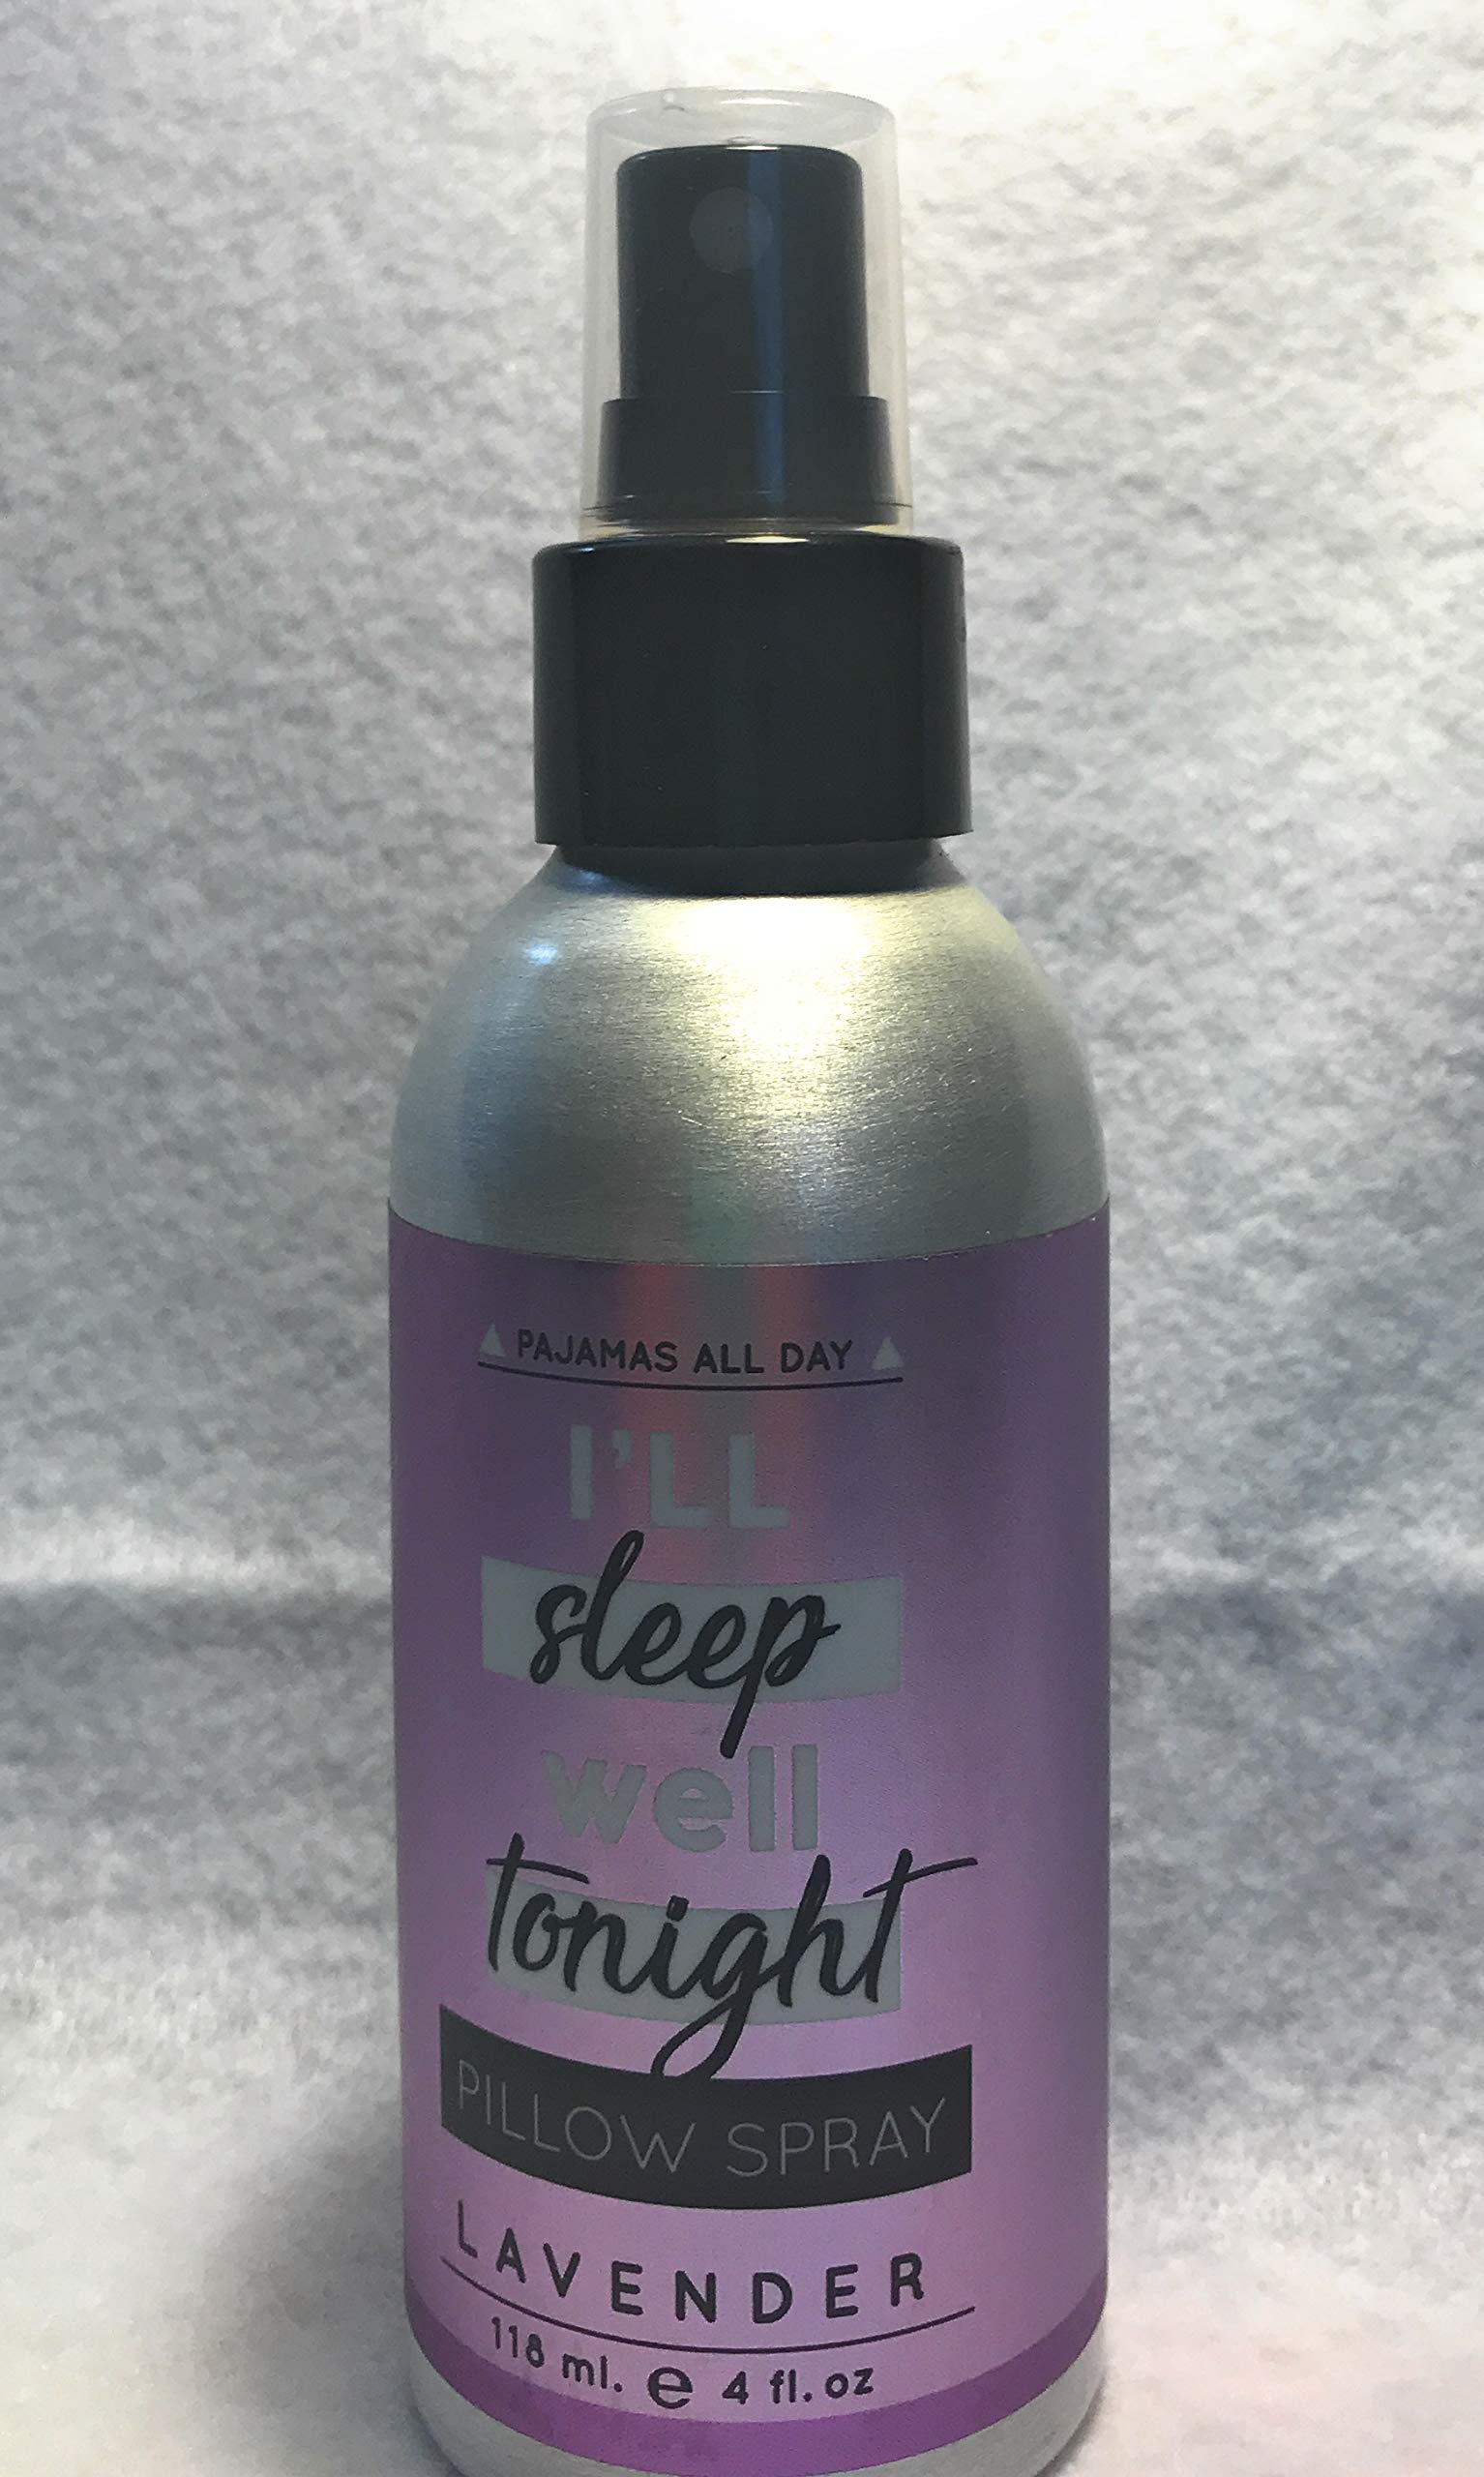 Pajamas All Day - I'll Sleep Well Tonight- Lavender Pillow Spray